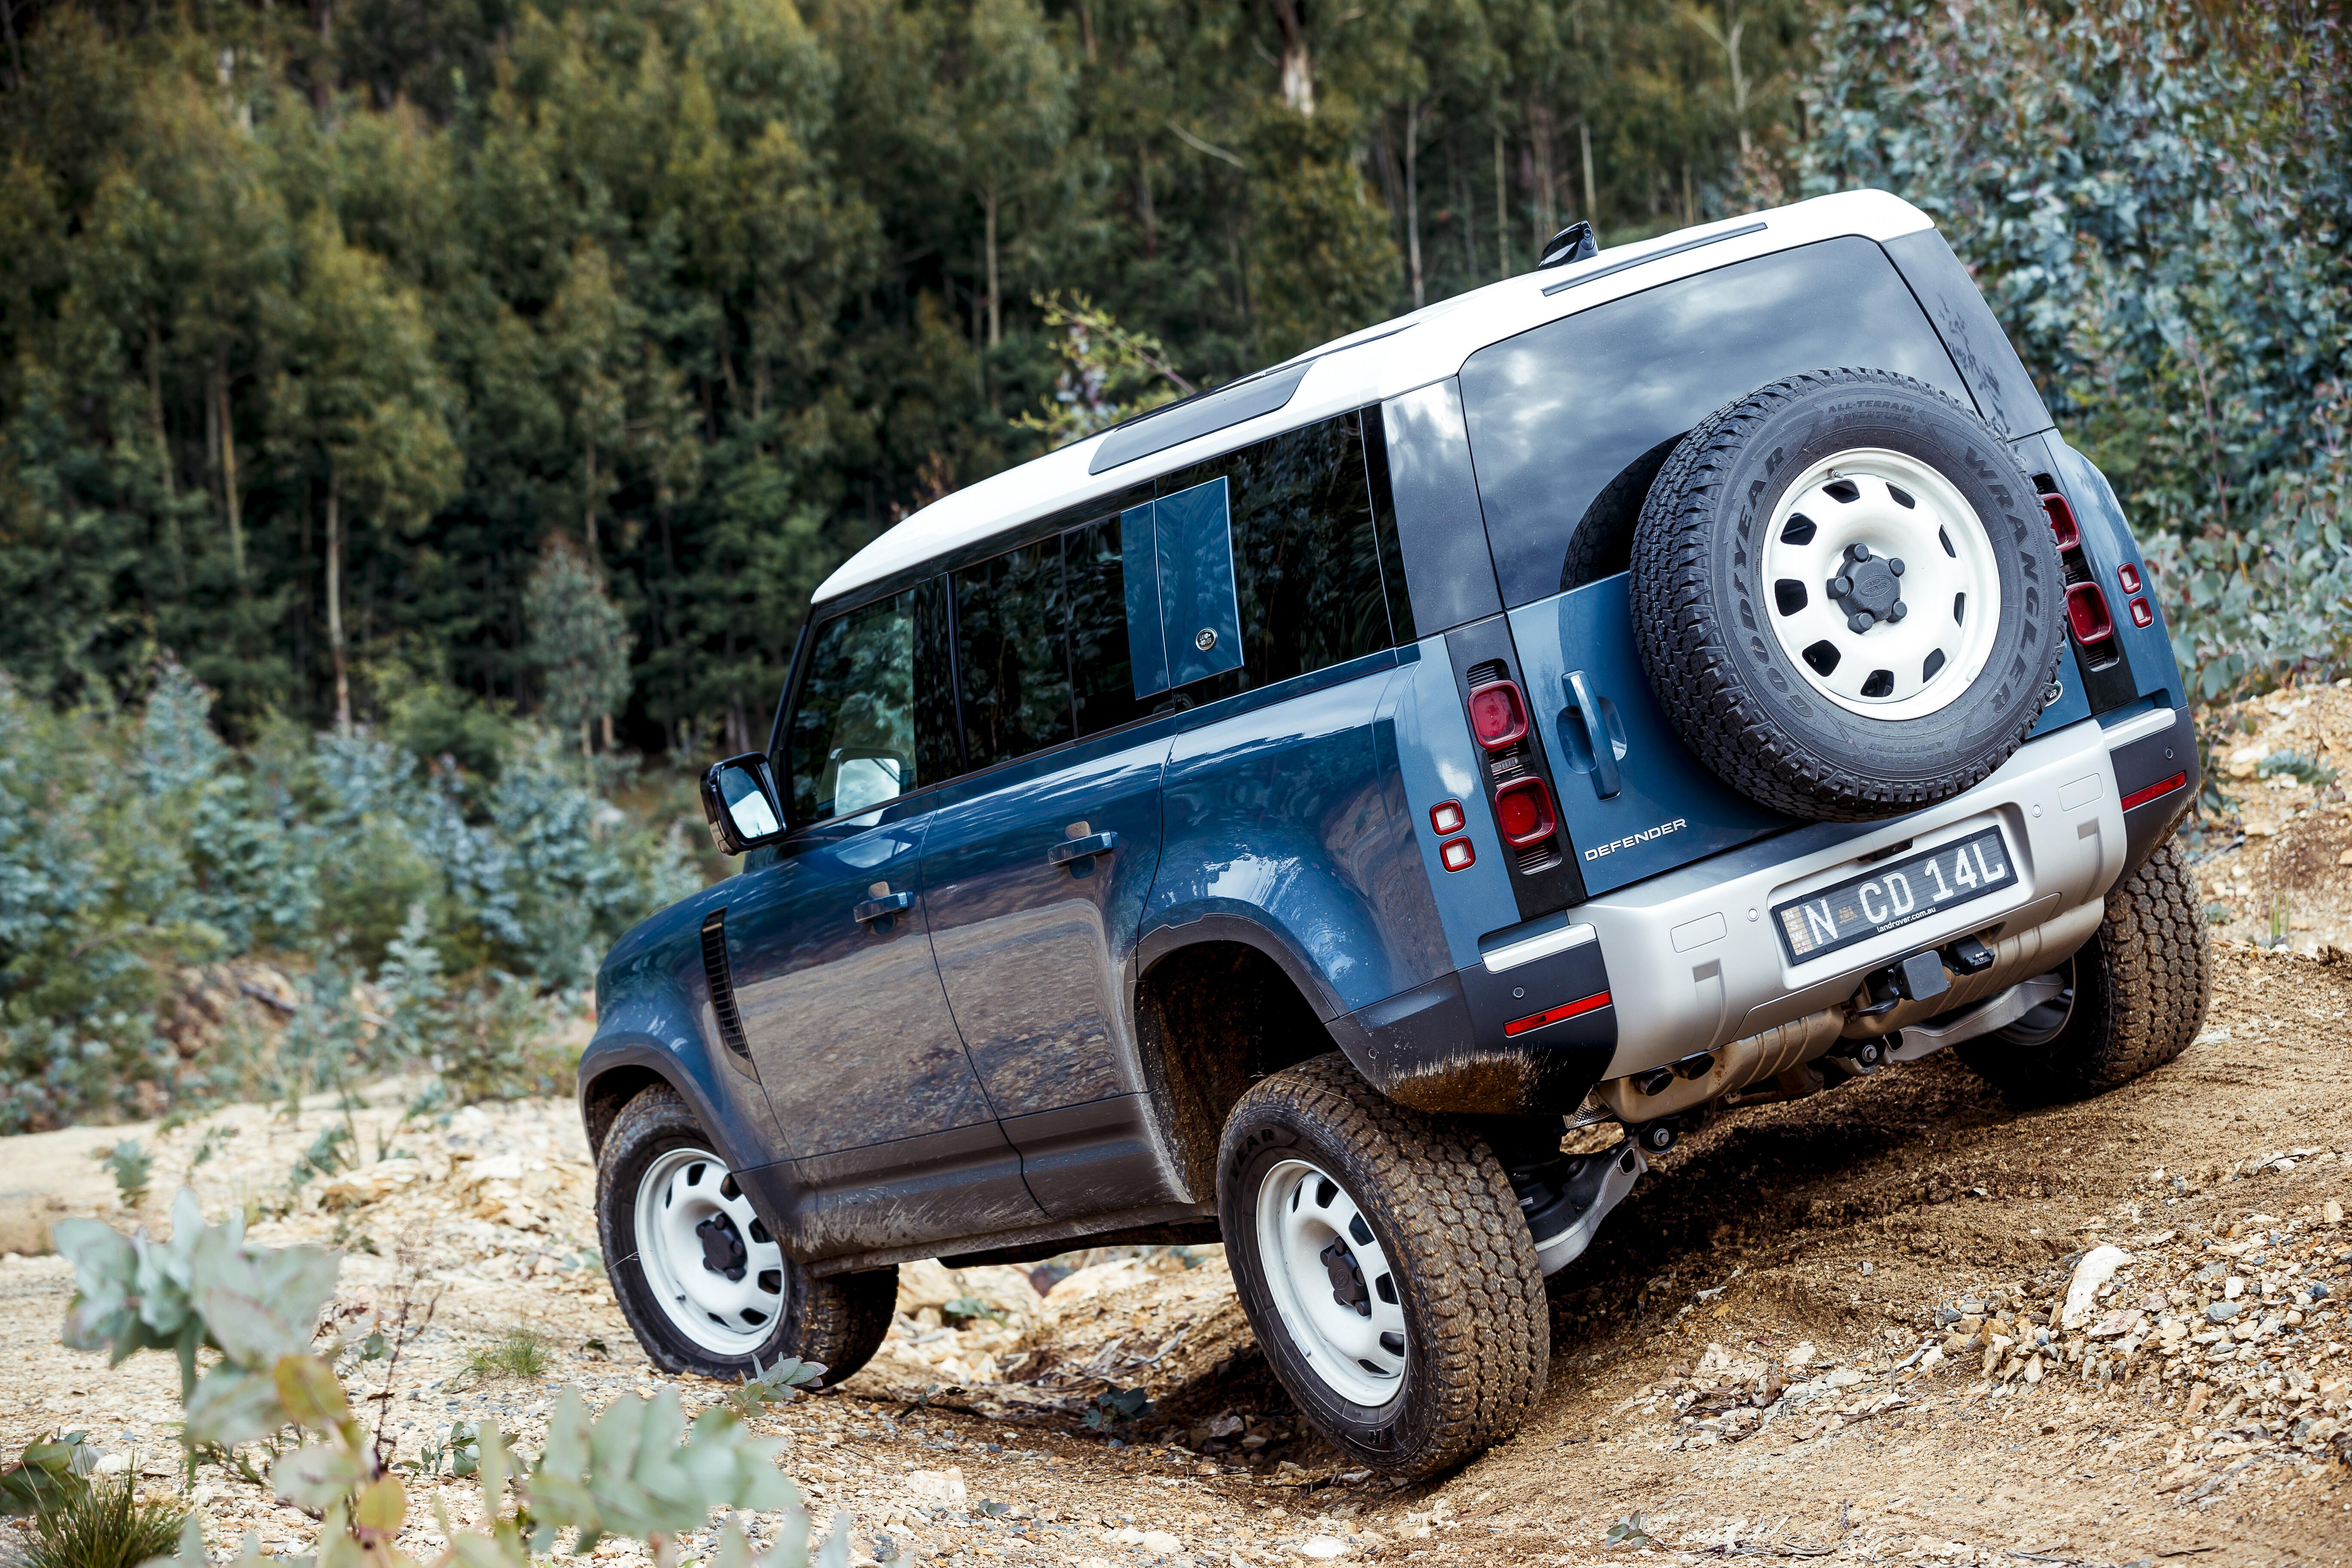 4 X 4 Australia Reviews 2021 June 2021 2021 Land Rover Defender 110 D 250 S 44